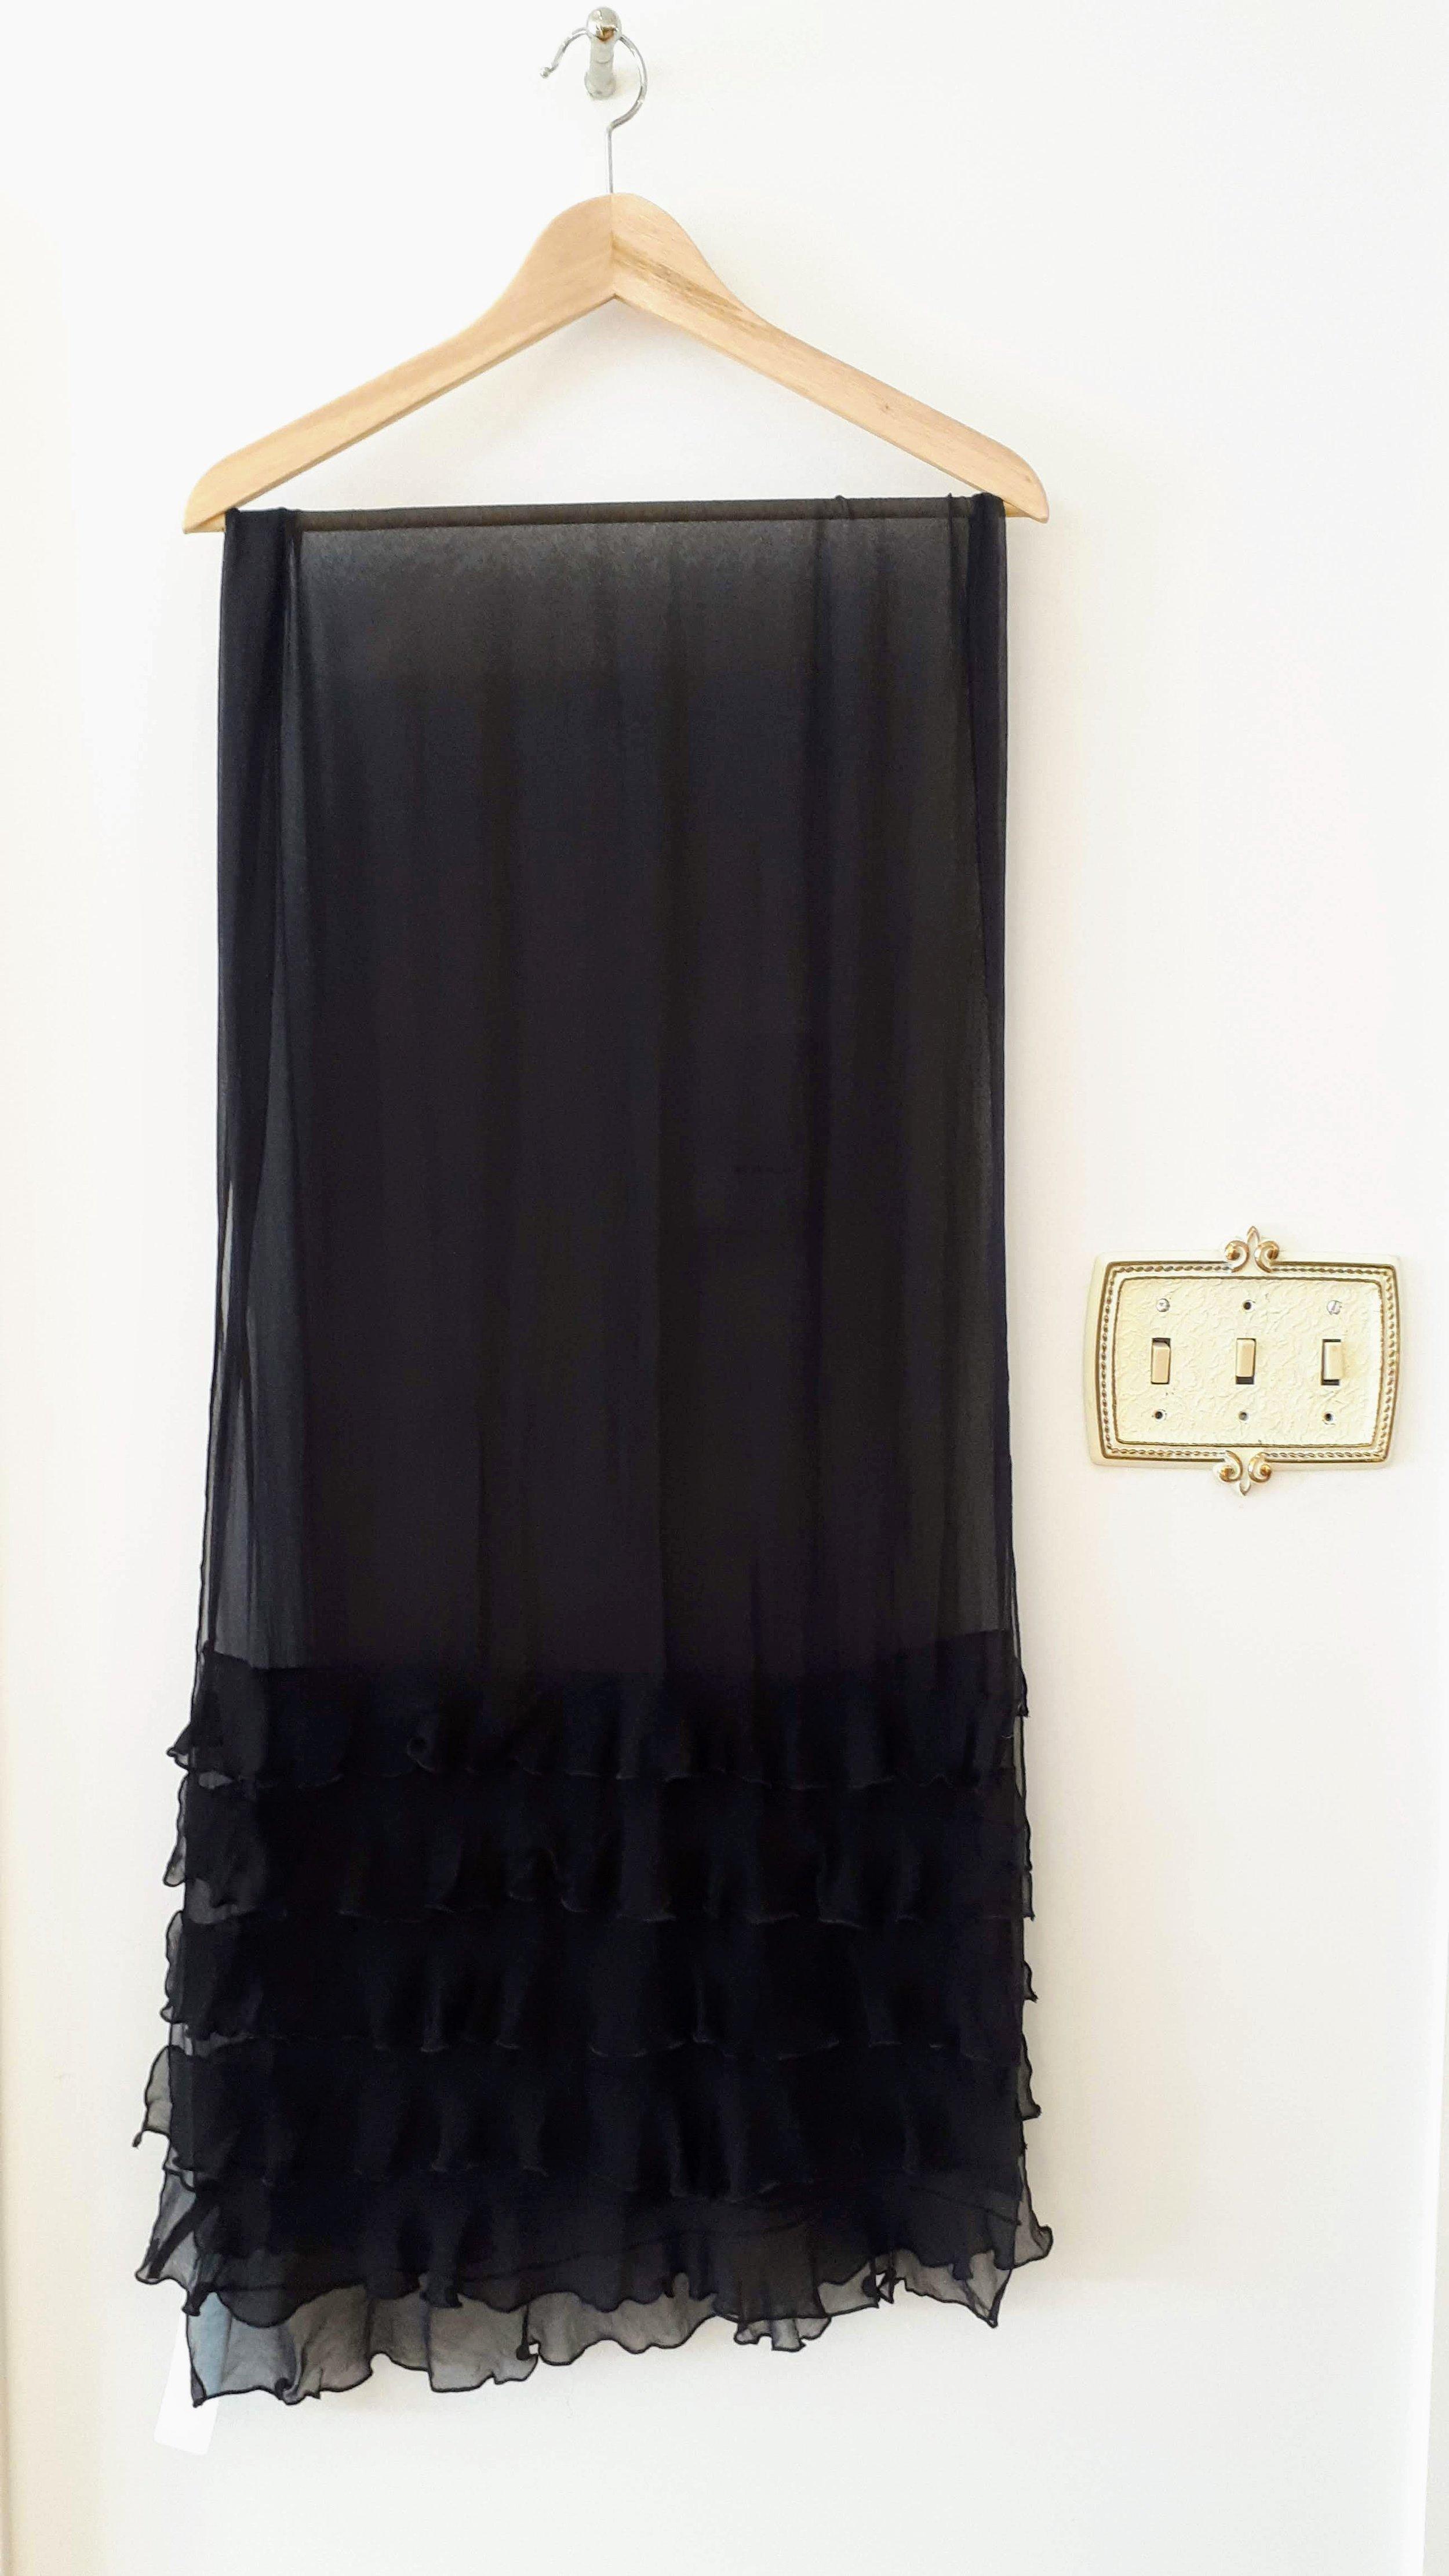 Silk scarf, $24